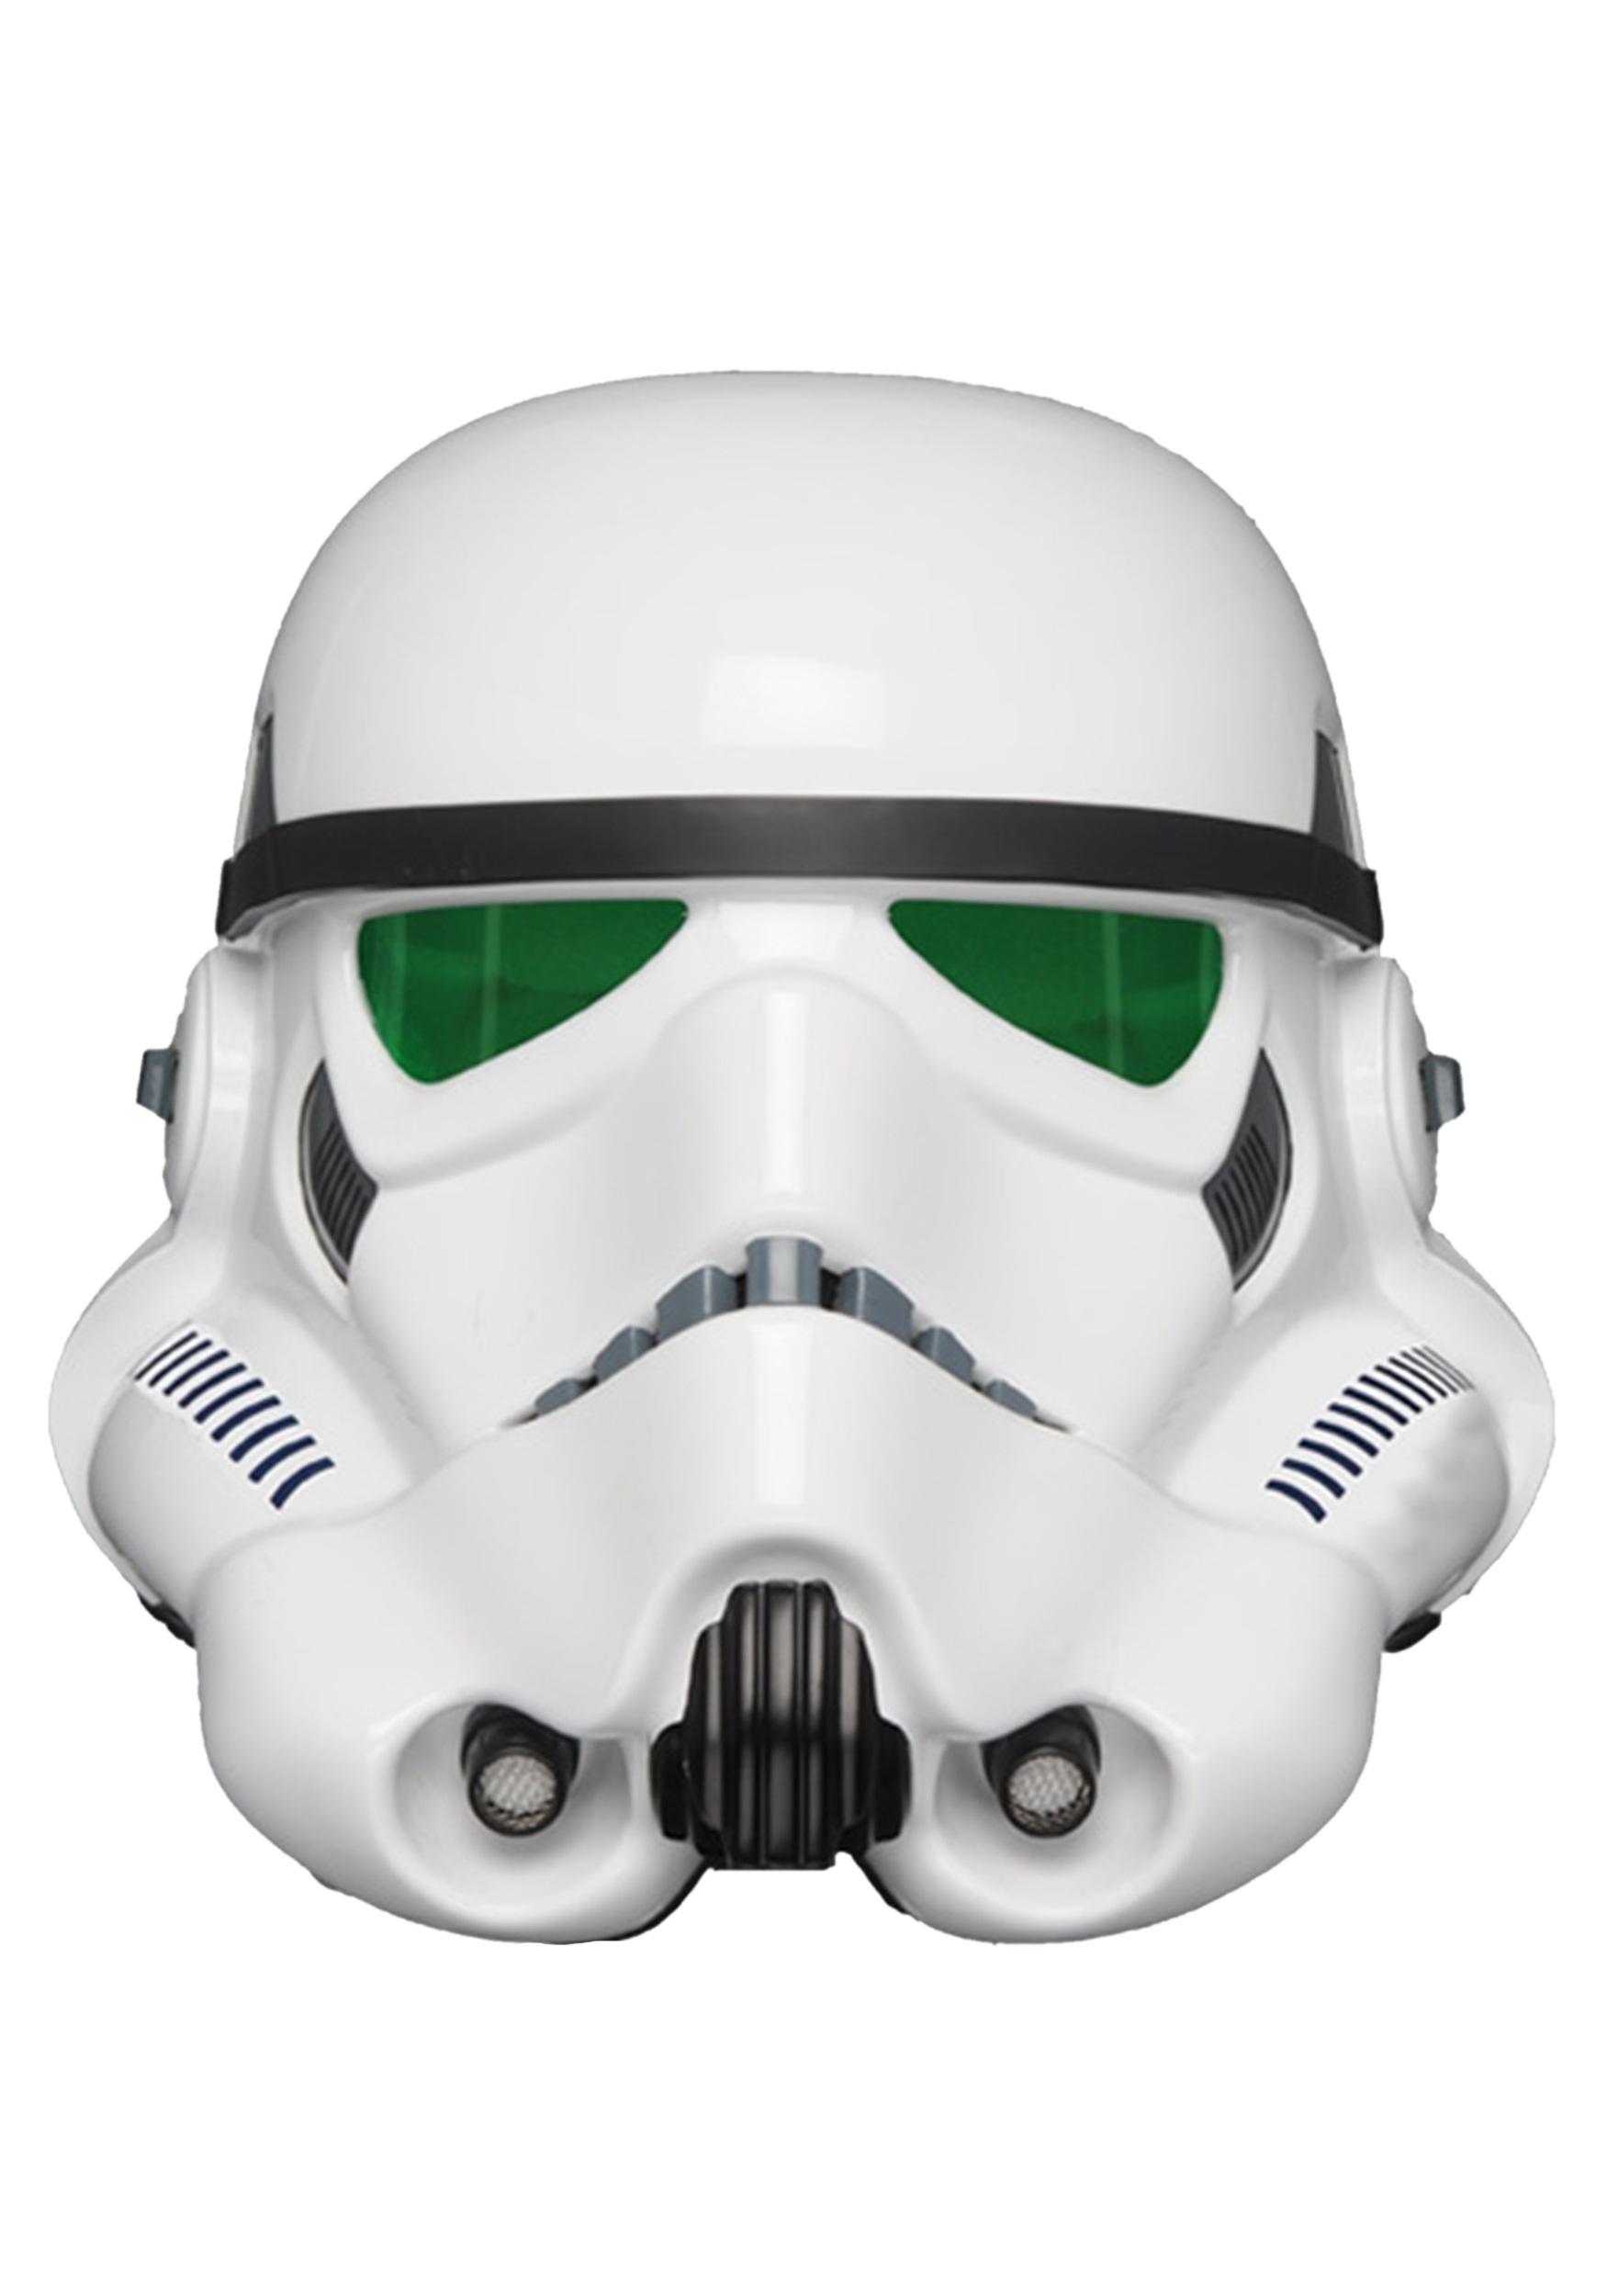 Mask clipart stormtrooper & Helmet A Armor New